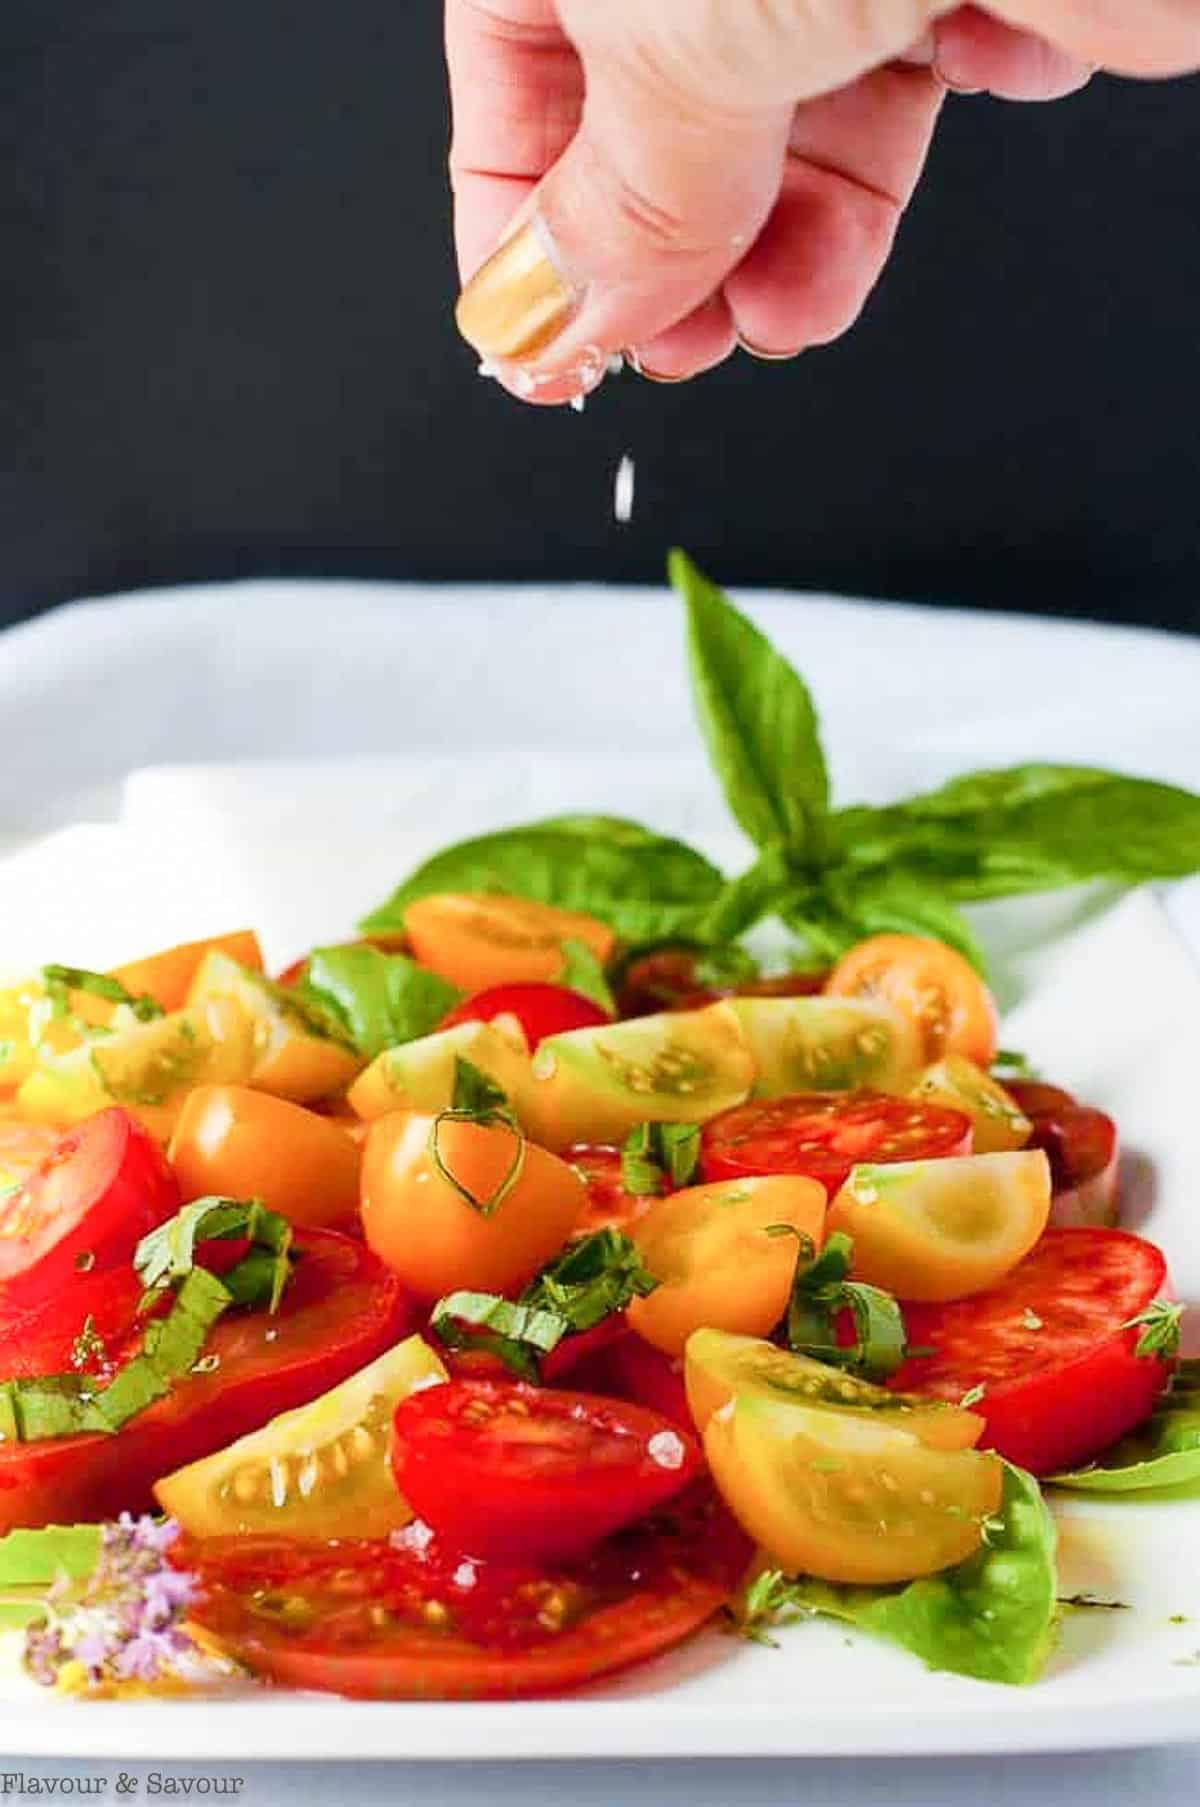 sprinkling coarse salt on Heirloom Tomato Salad with Feta Cheese